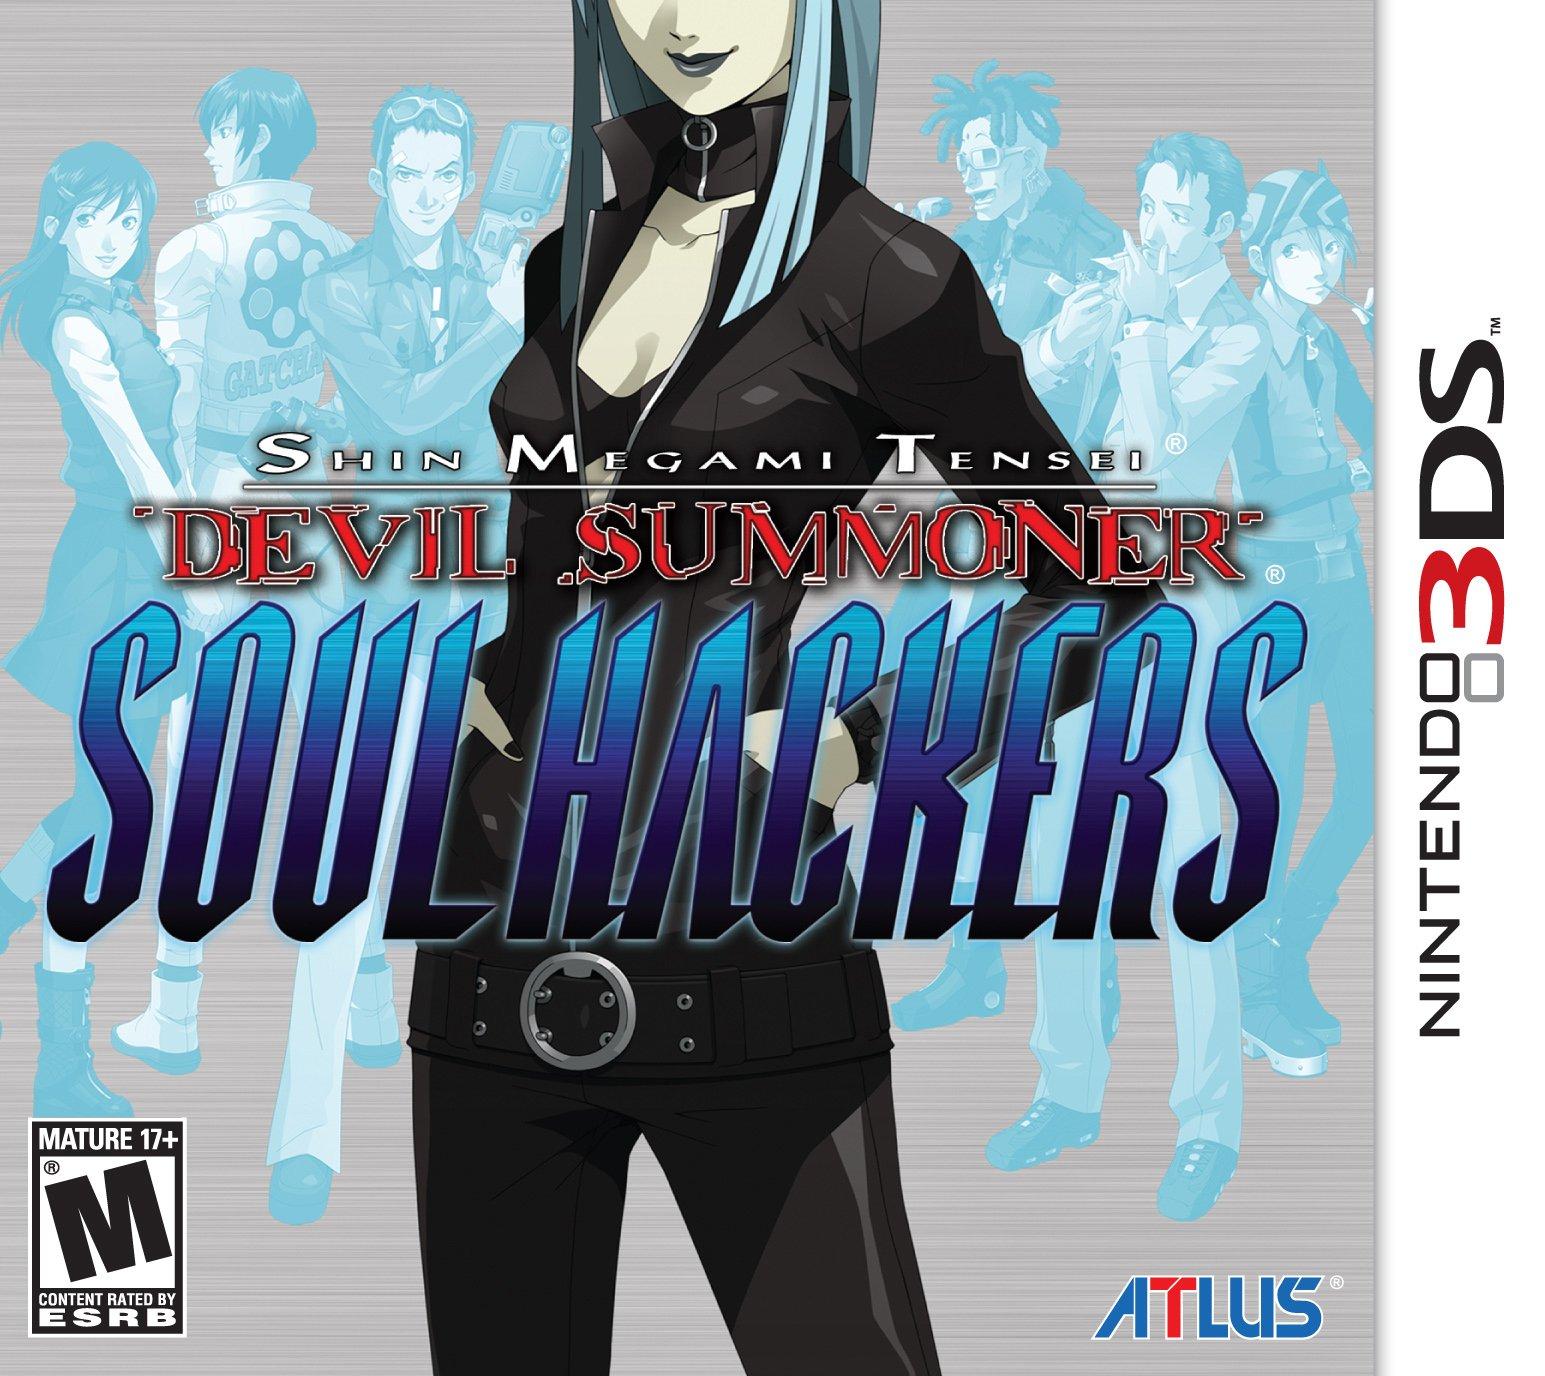 Shin Megami Tensei: Devil Summoner: Soul Hackers - Nintendo 3DS